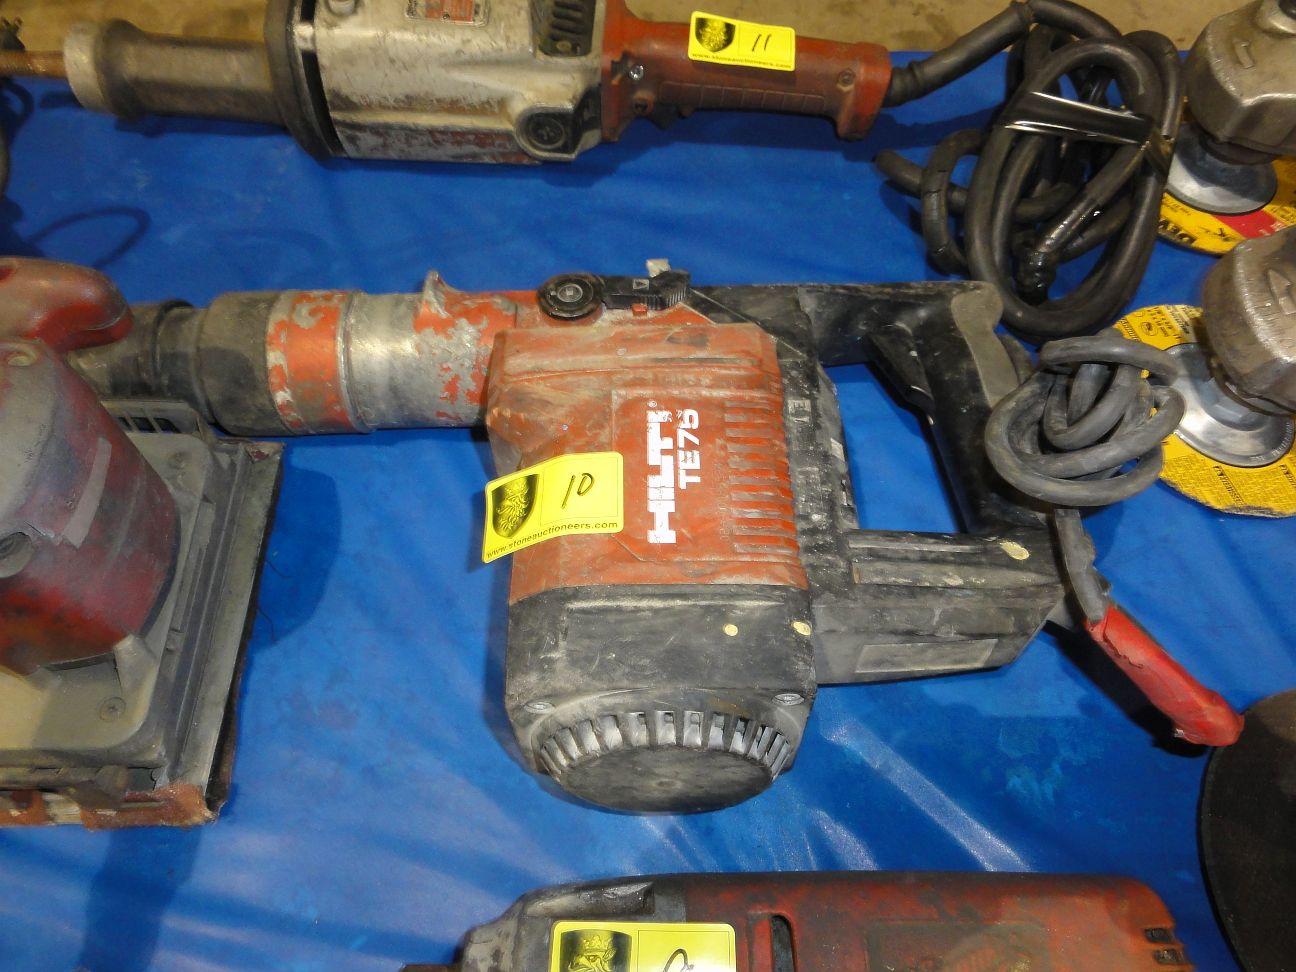 Lot 10 - Hilti TE75 Rotary Hammer Drill